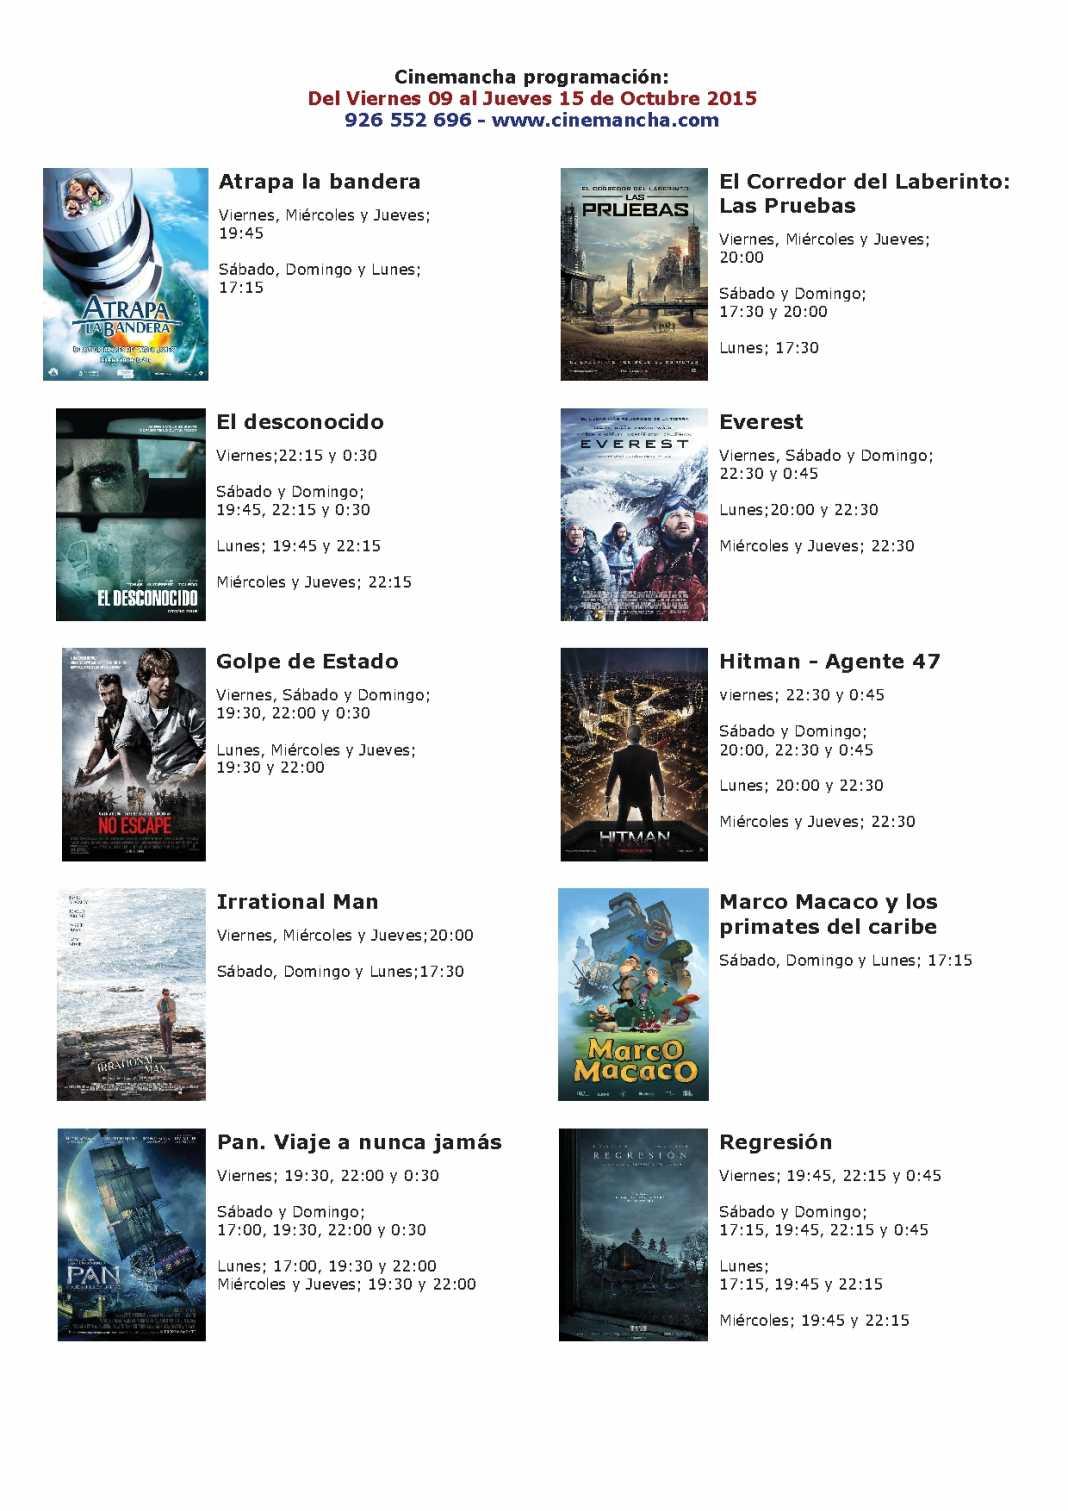 cartelera de cinemacha del 09 al 15 de octubre 1068x1511 - Cartelera Cinemancha del 9 al 15 de octubre